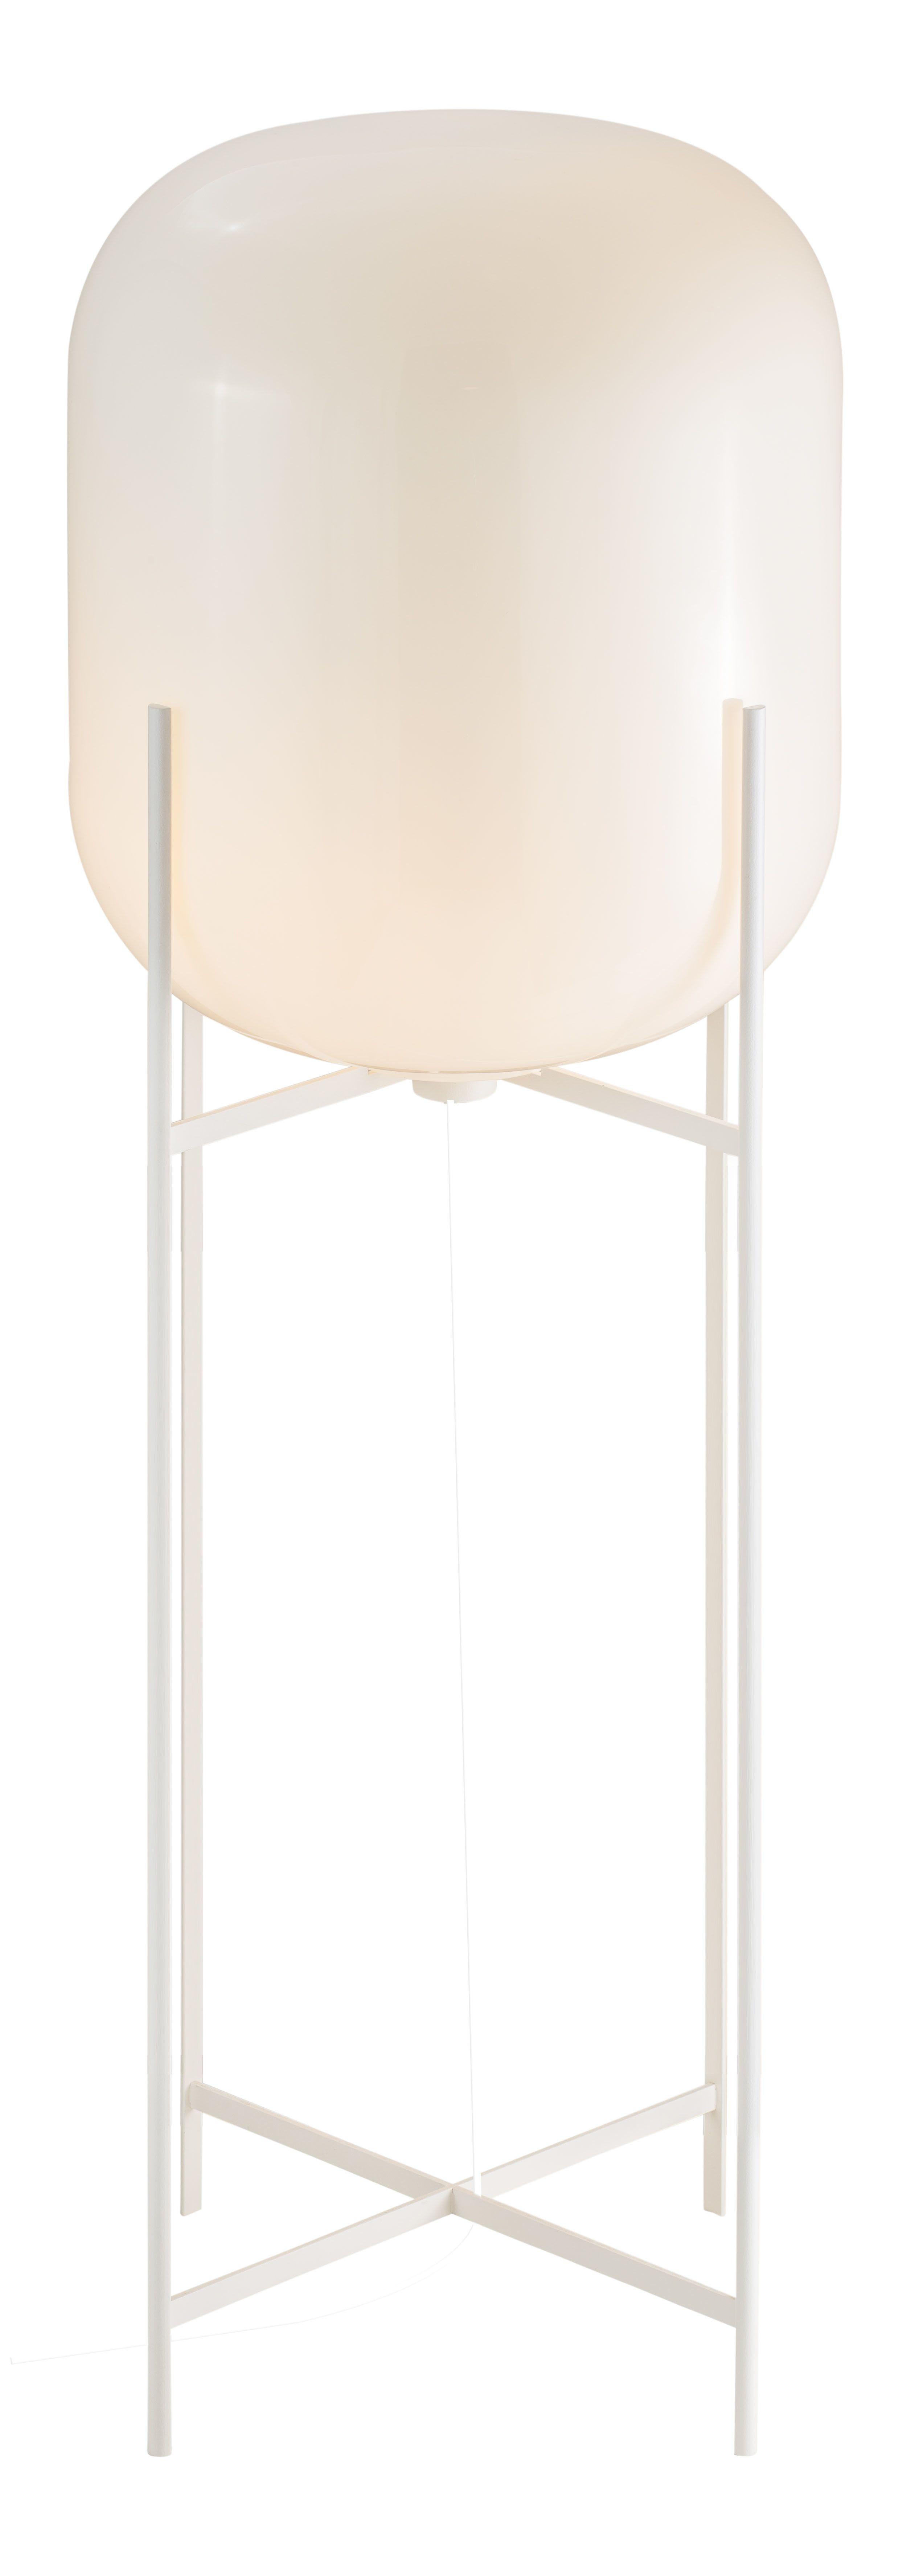 Floor Lamp Oda Big By Sebastian Herkner For Pulpo Materials Colors White Glass White Powder Coated Steel Lamp White Glass Floor Lamp